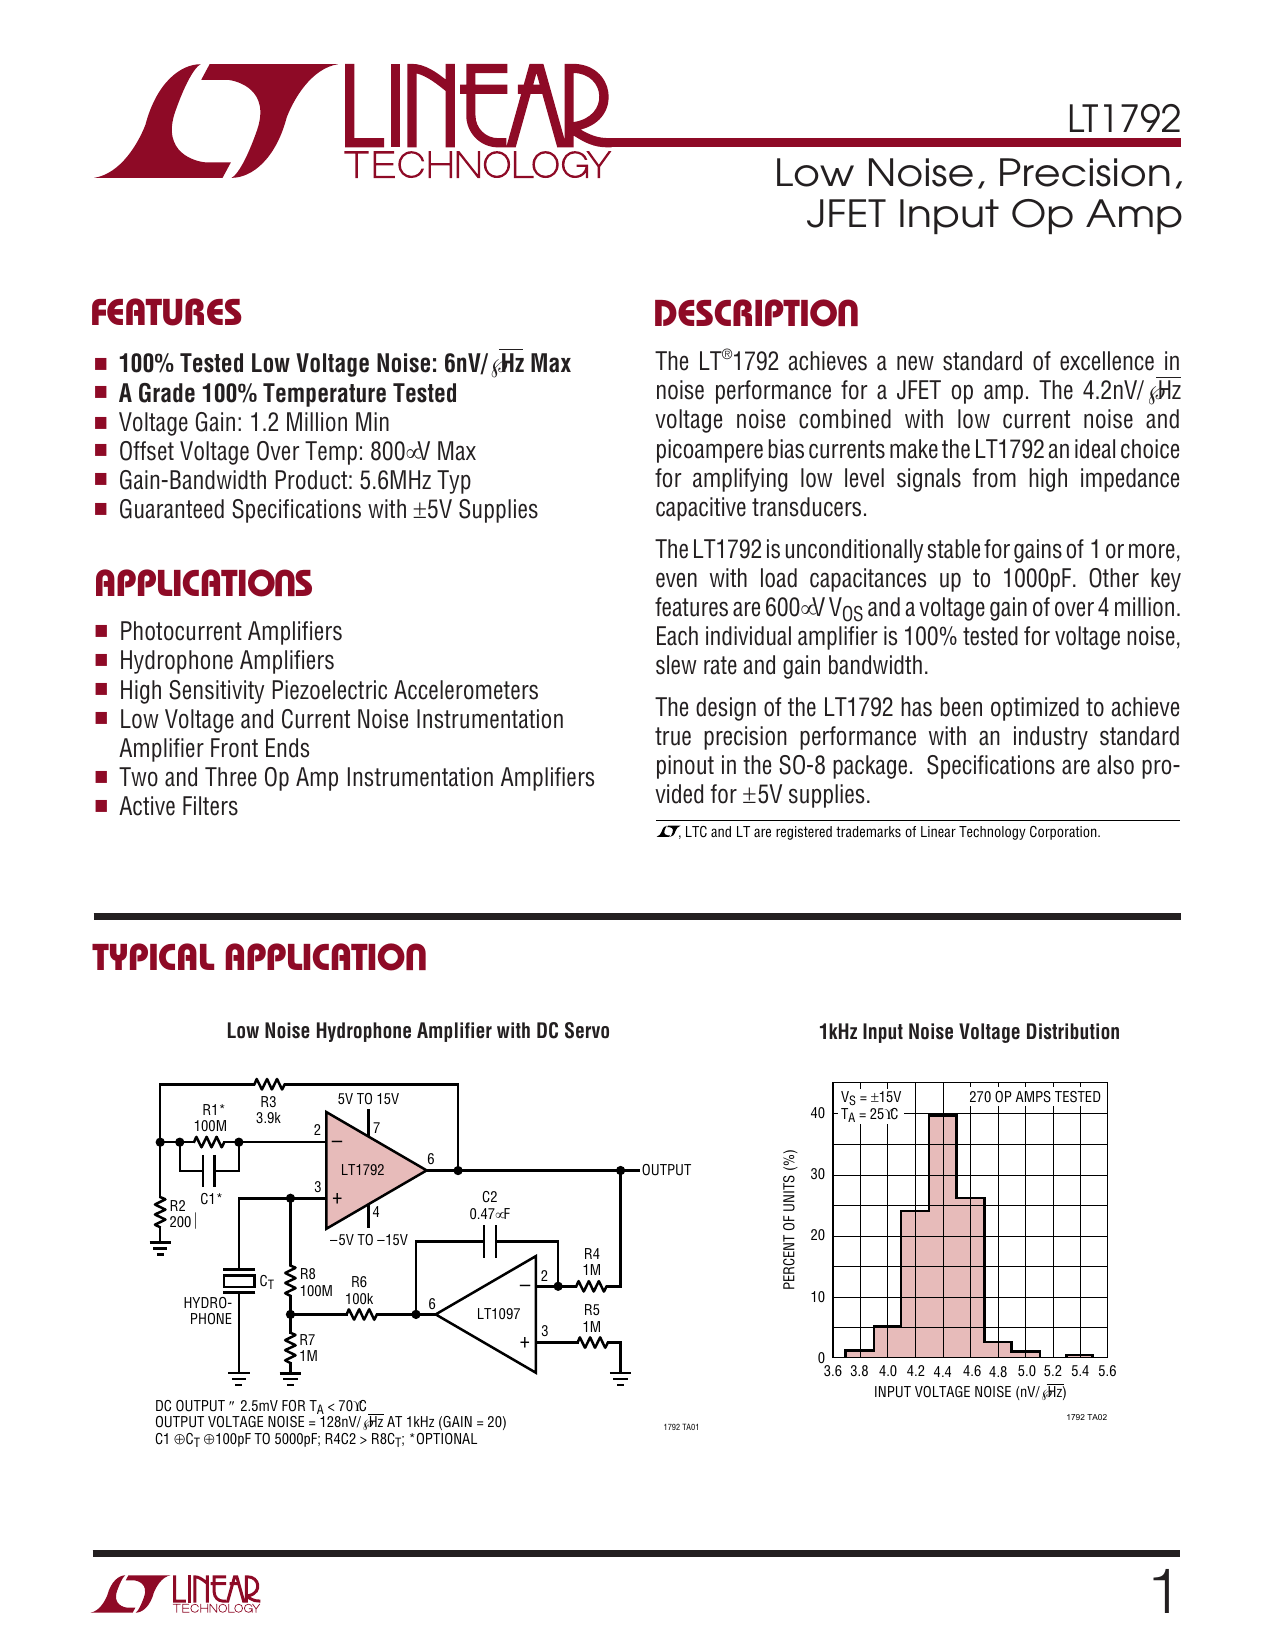 Lt1792 Low Noise Precision Jfet Input Op Amp 20v Ultra Amps